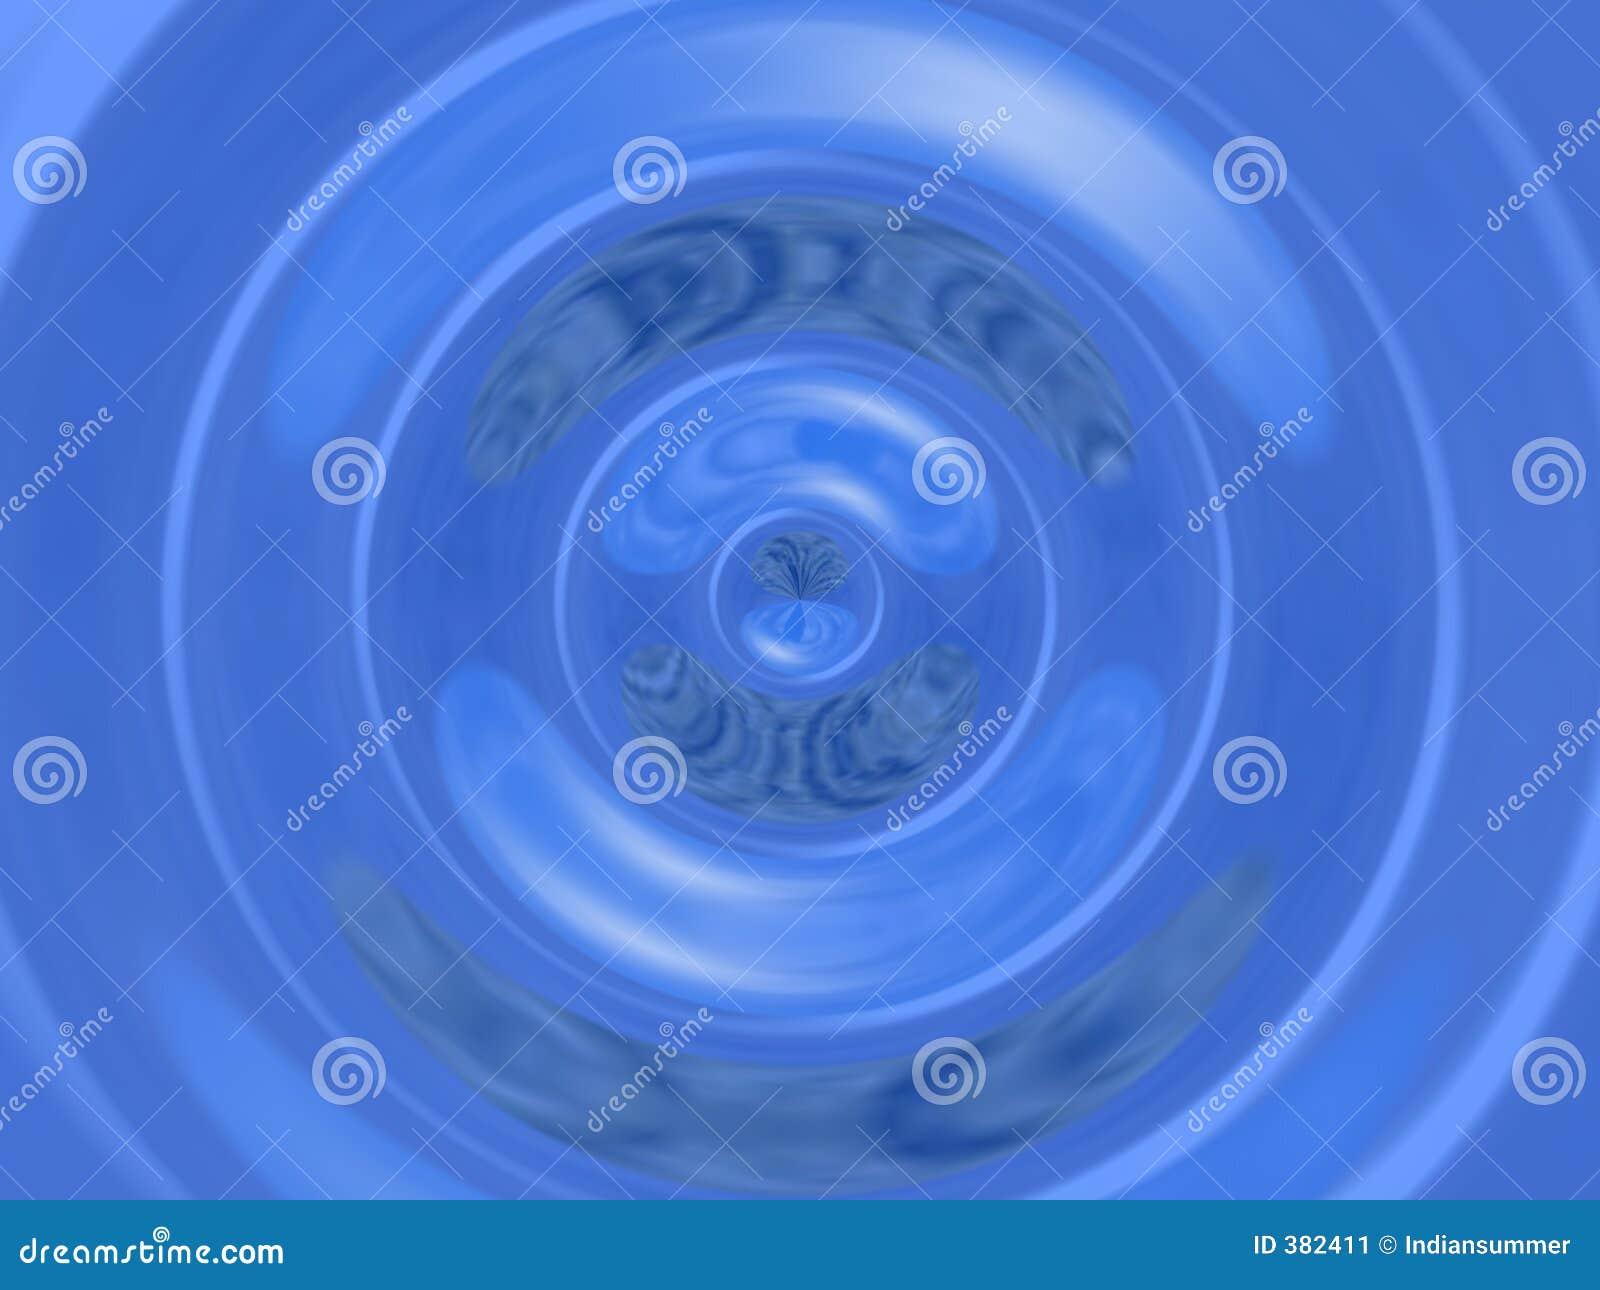 Grand waterdrop